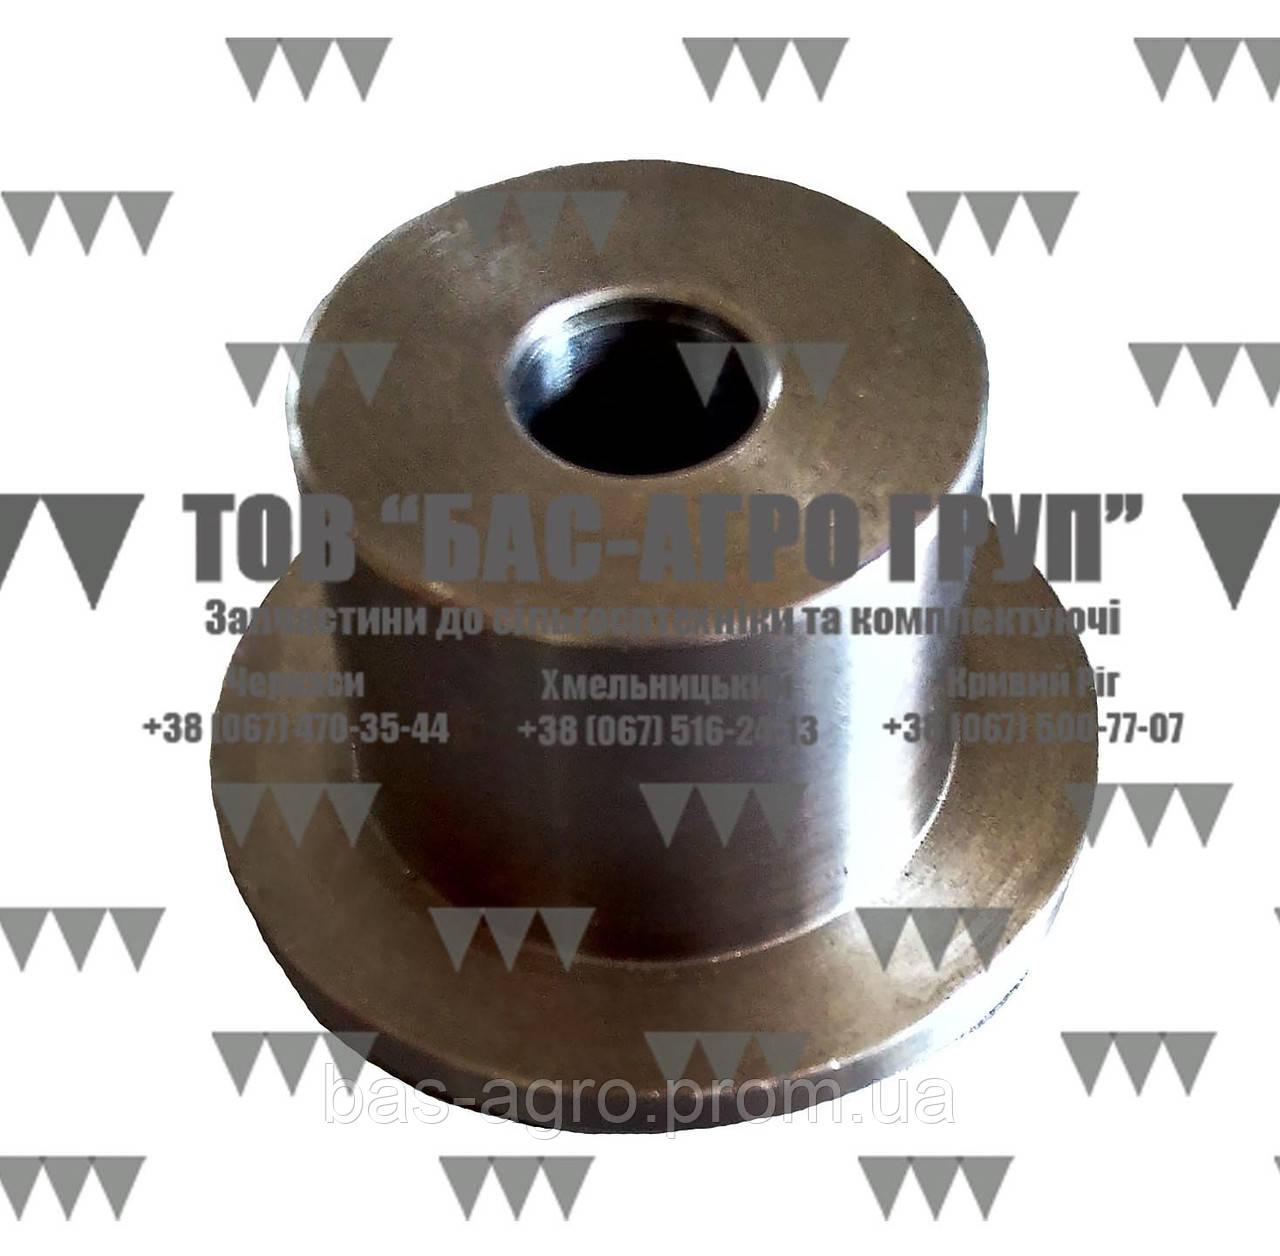 Втулка Geringhoff 002152 аналог